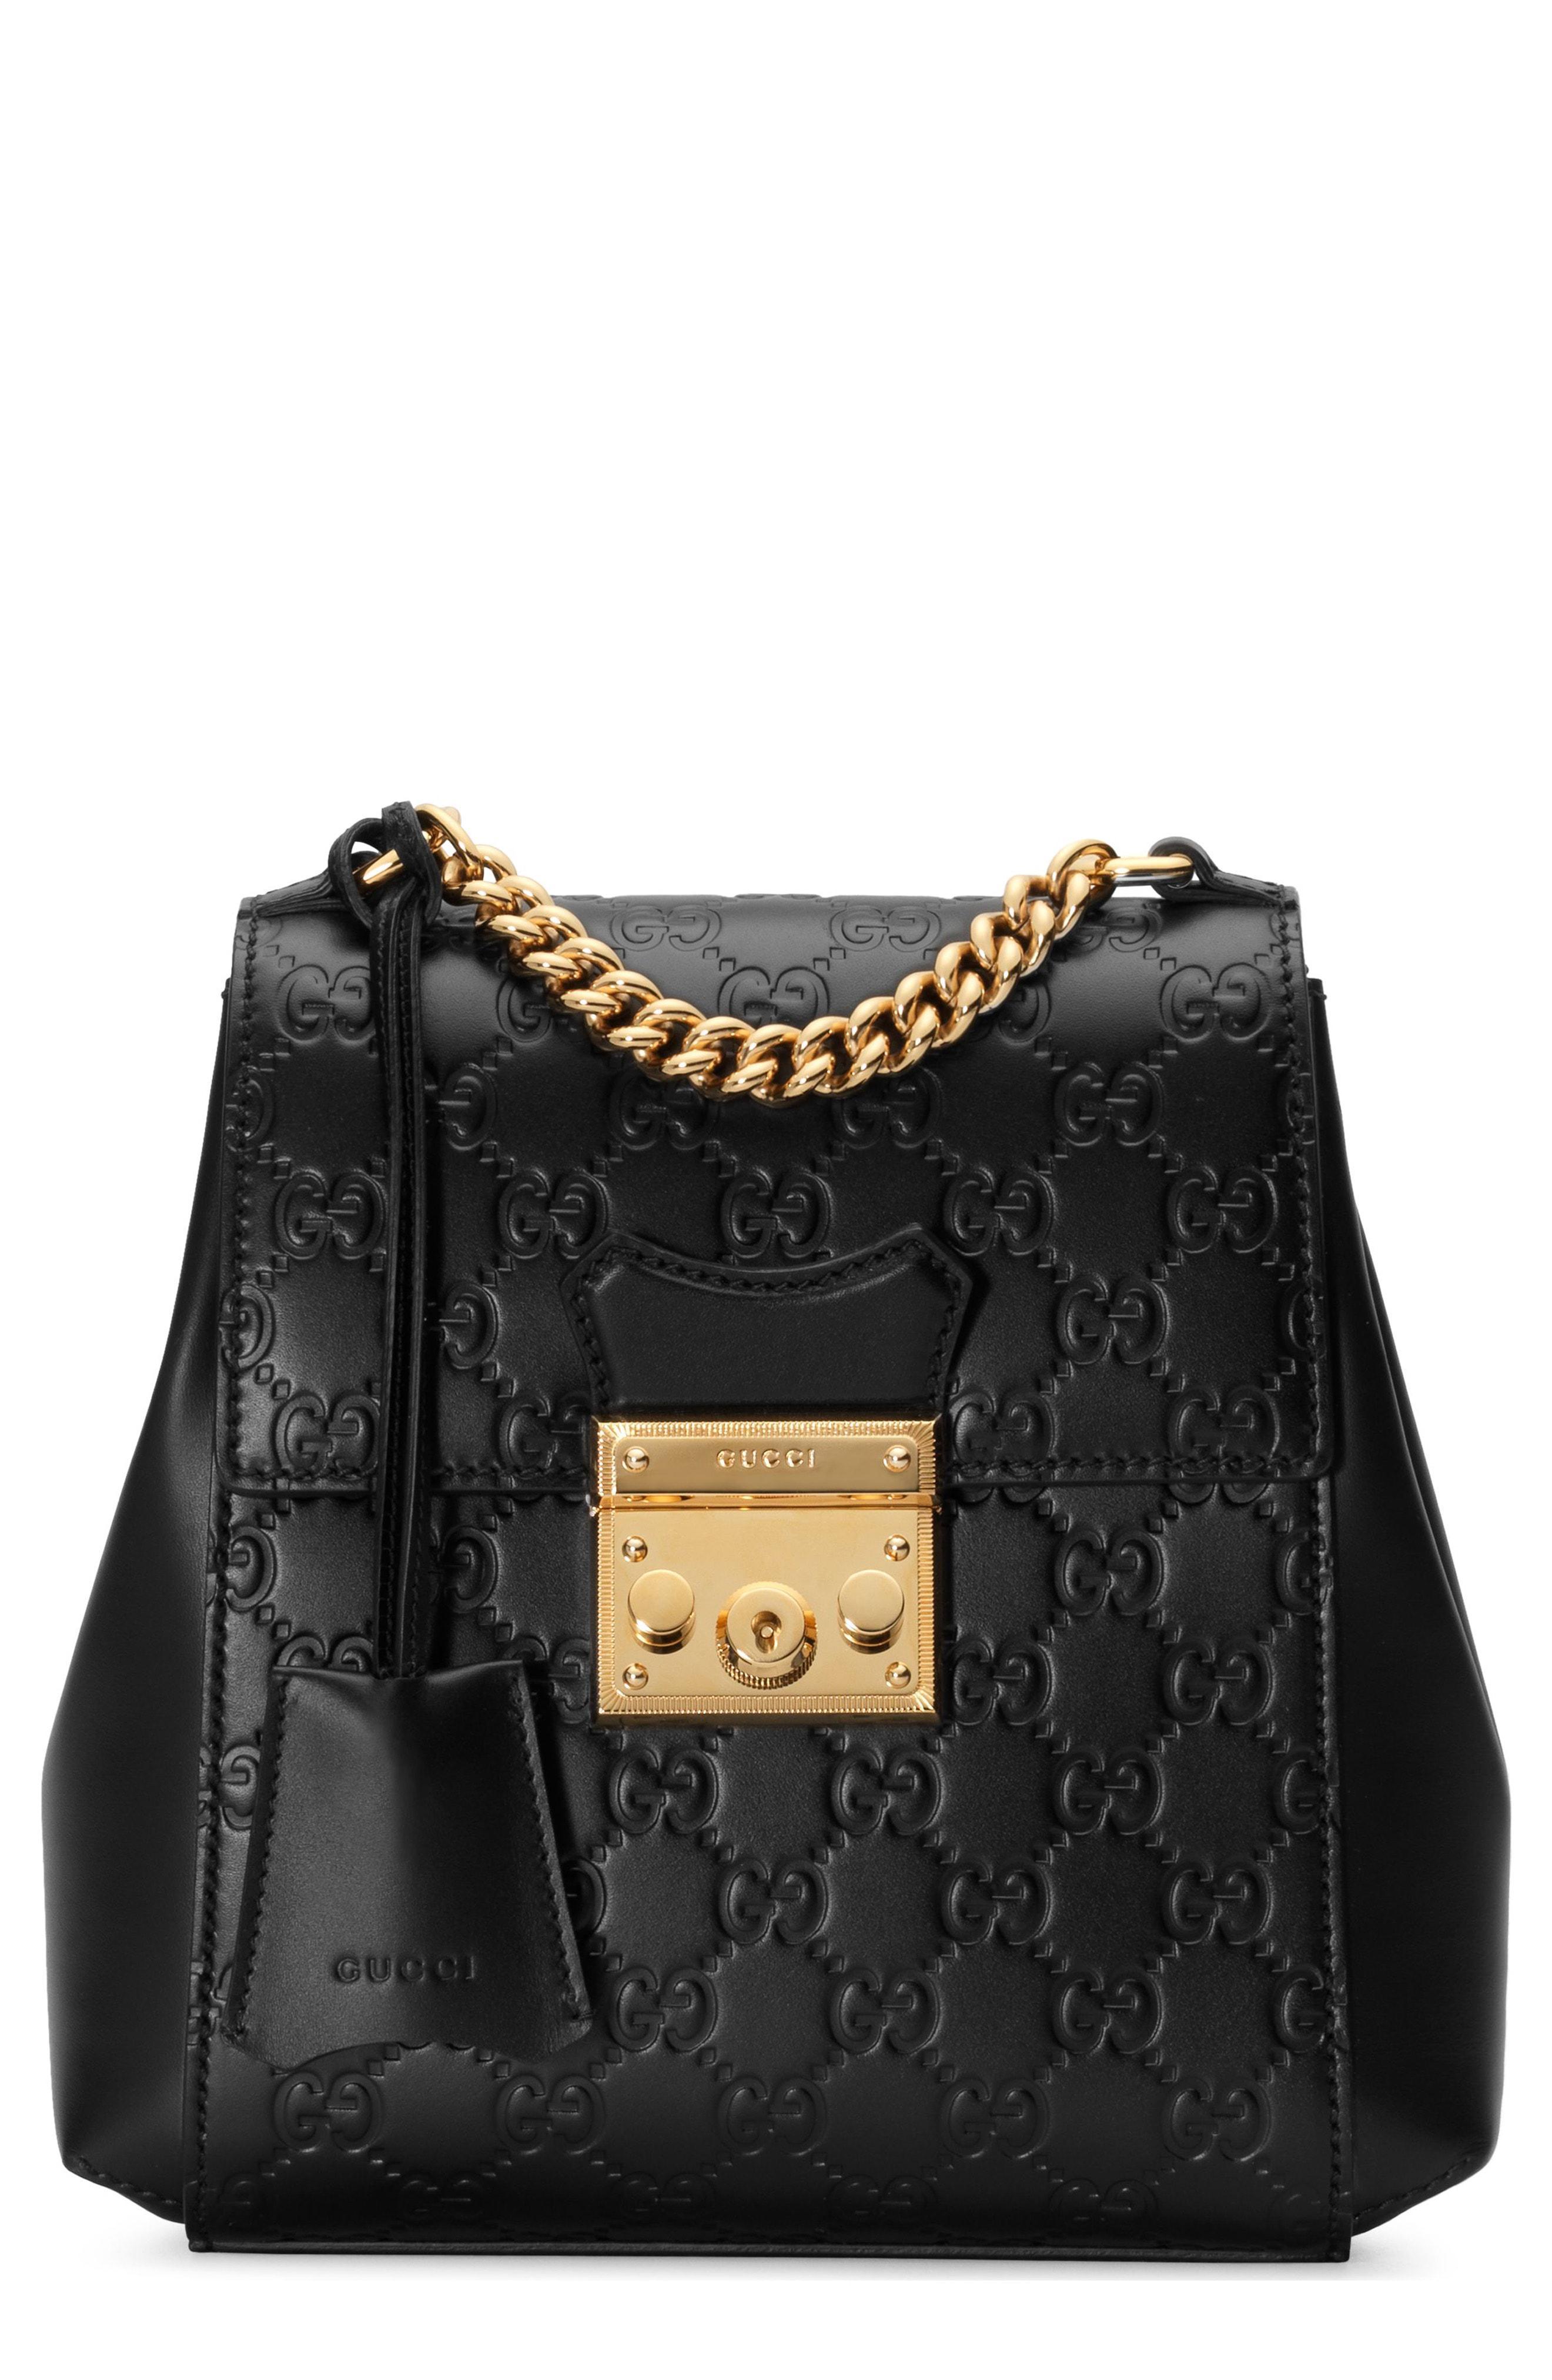 17188e93de9 Lyst - Gucci Gg Supreme Leather Padlock Backpack - in Black